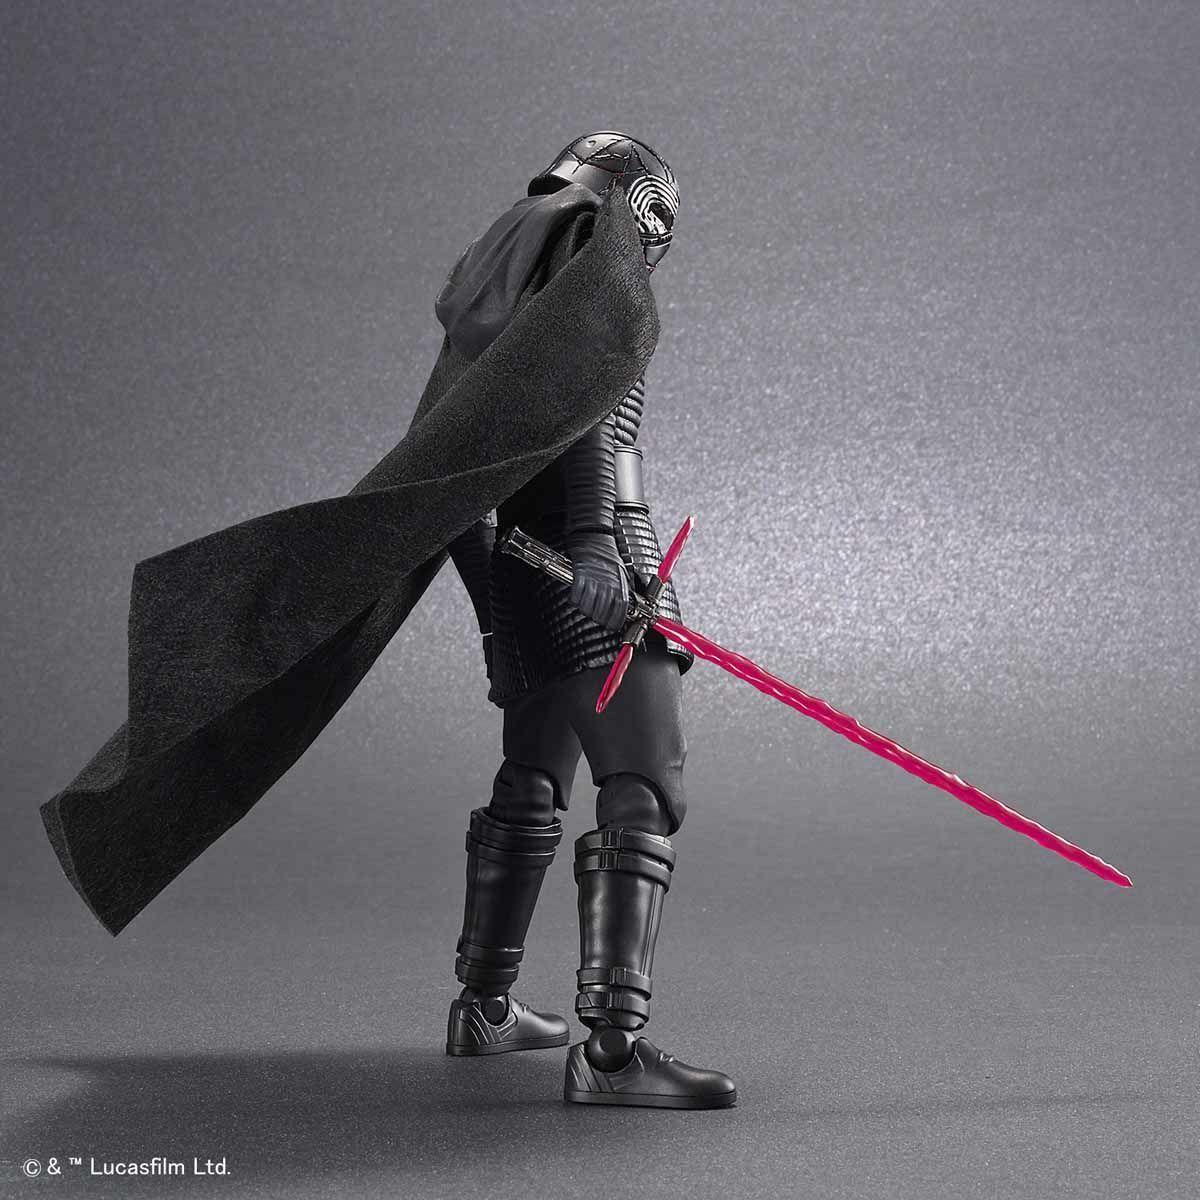 Bandai Star Wars Kylo Ren 1:12 Scale Model Kit Rise of Skywalker